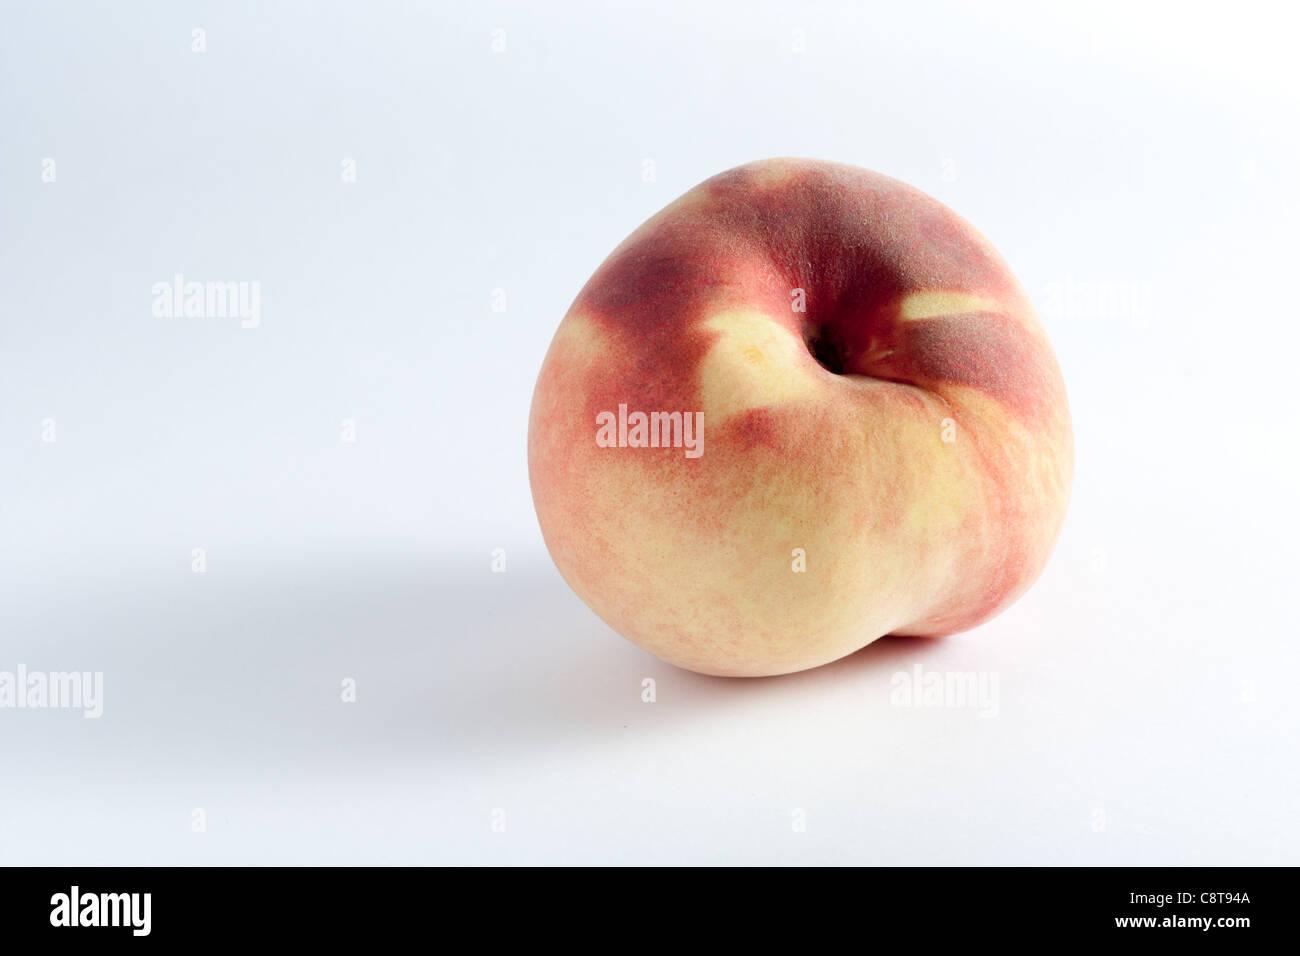 White Peach - Stock Image